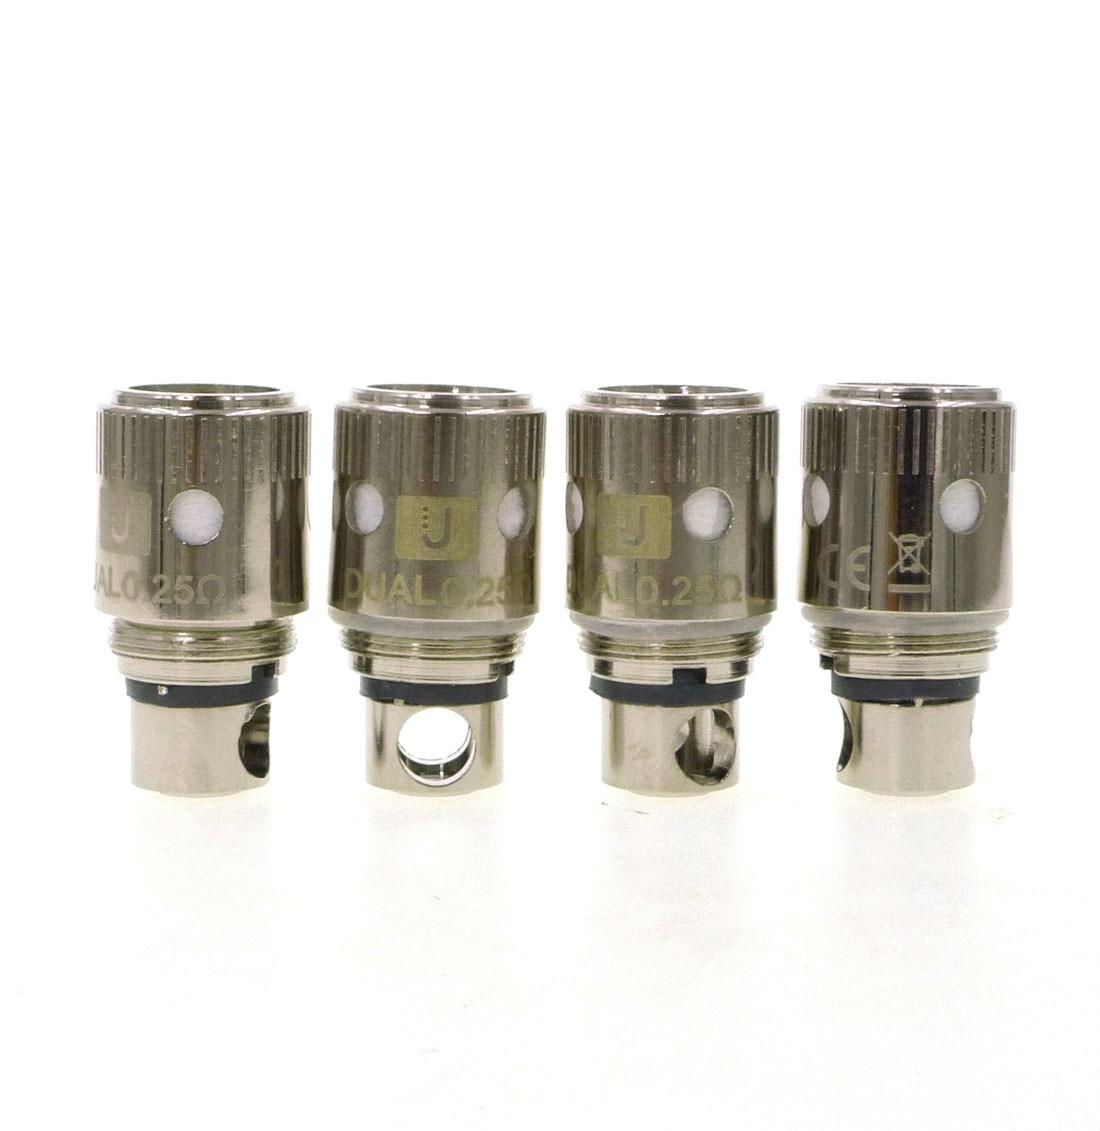 4Pcs Crown Sub-Ohm Tank Replacement Head DUAL COIL 0.25/0.5 Ni200 0.15ohm